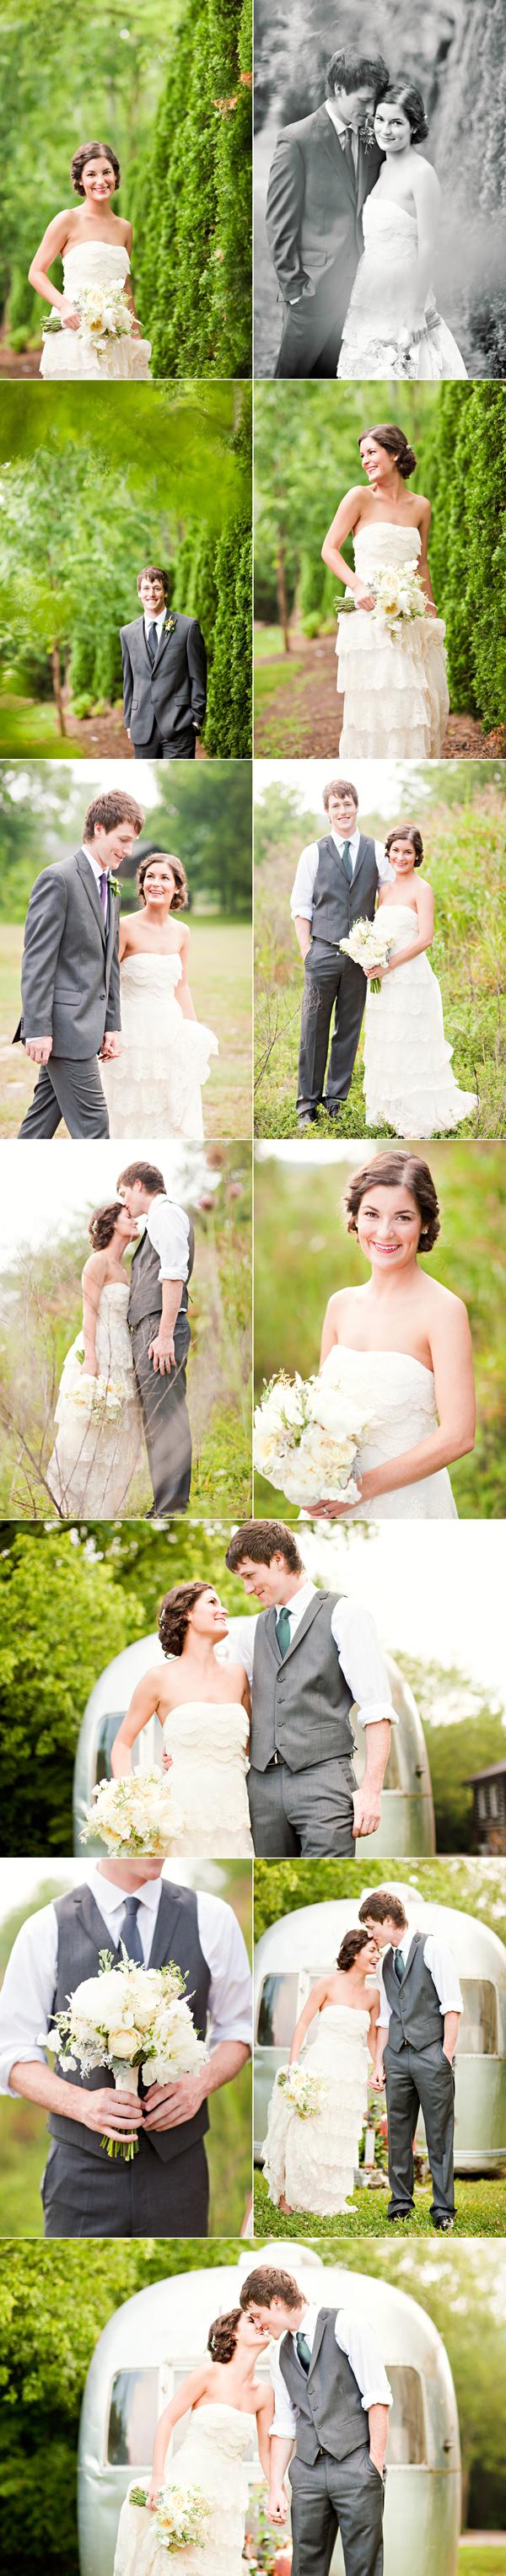 Local Nashville Vendors | Wedding photography, Nashville ...